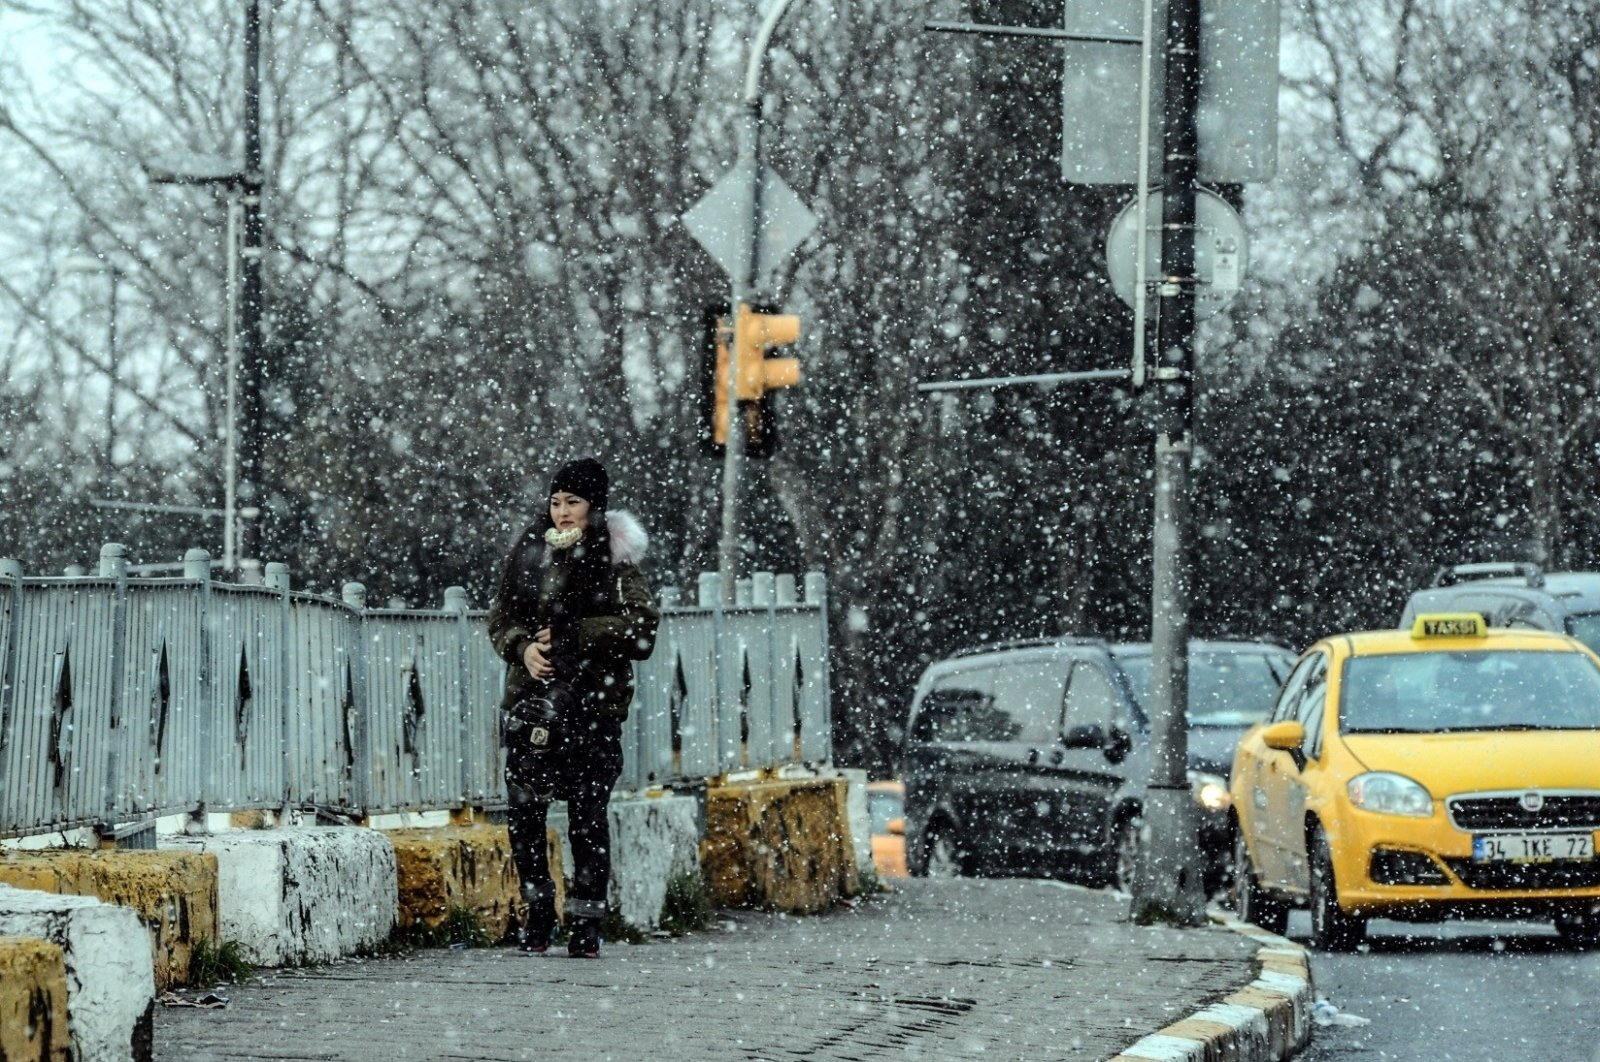 A woman walks on a street as snow falls in Istanbul, Turkey, Jan. 8, 2019. (AA Photo)